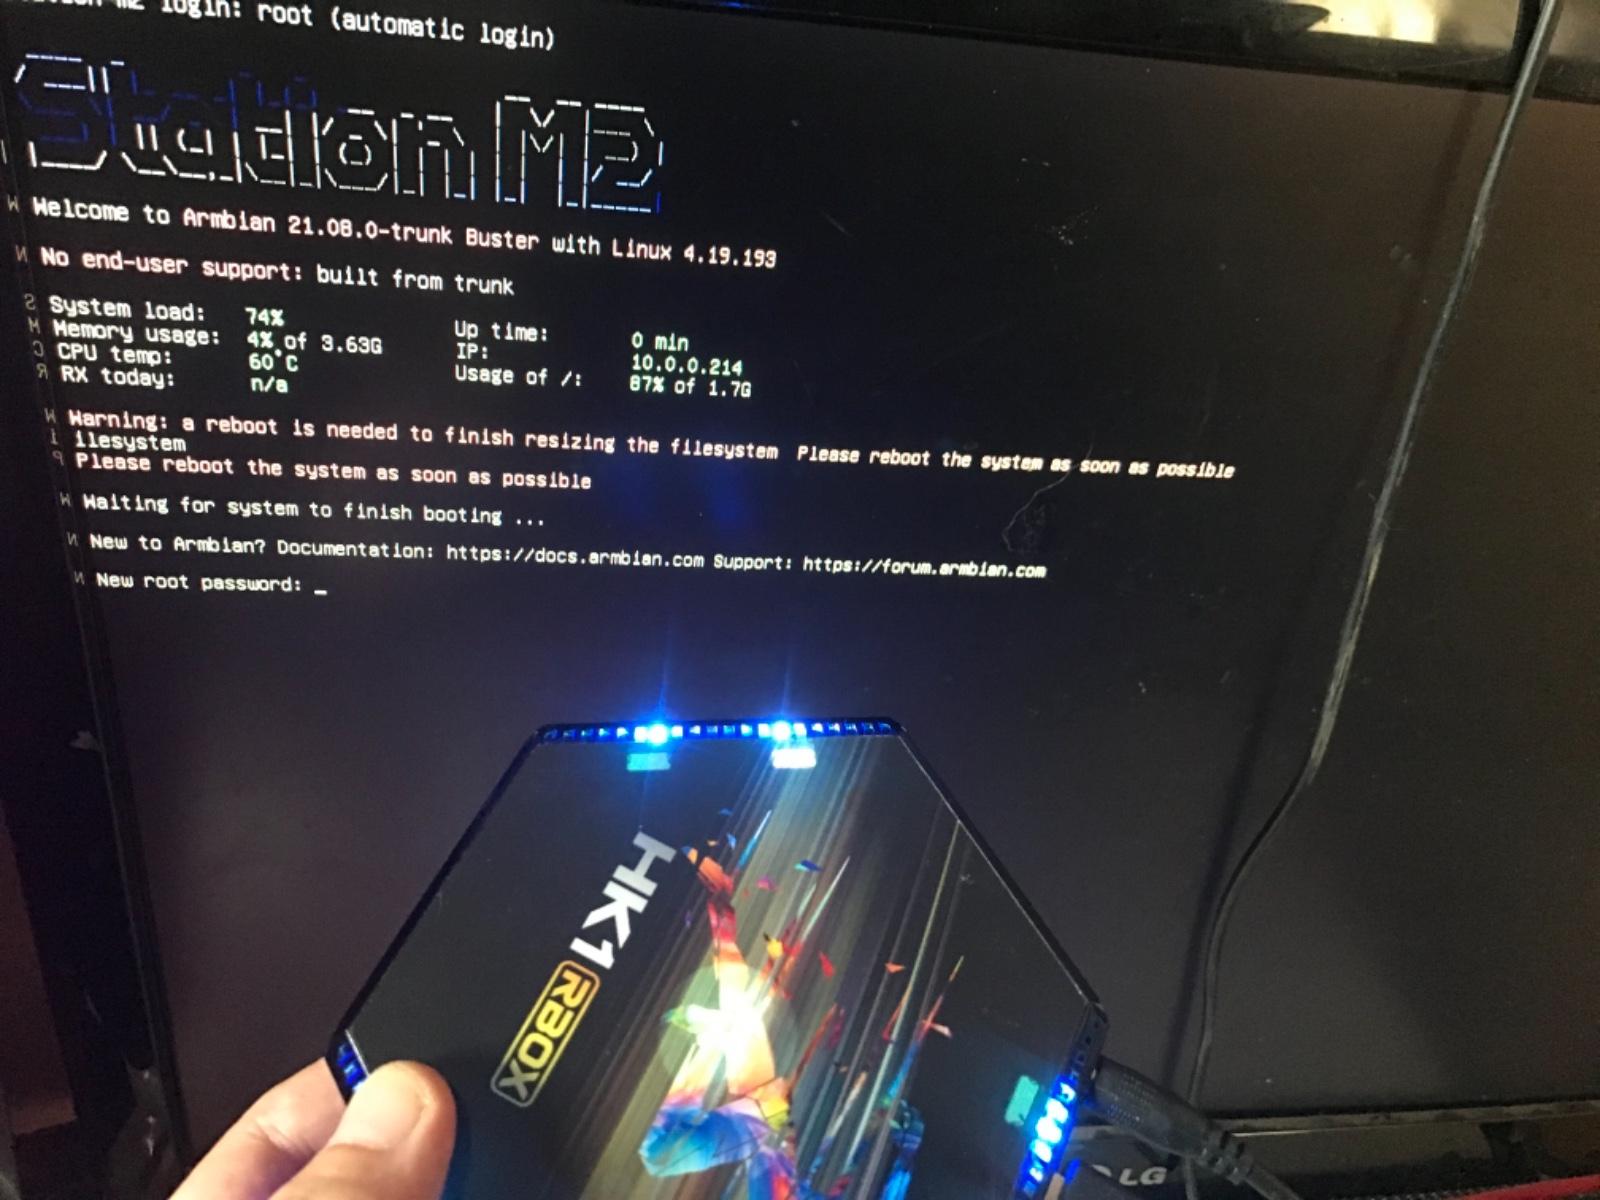 Hk1rboxr2